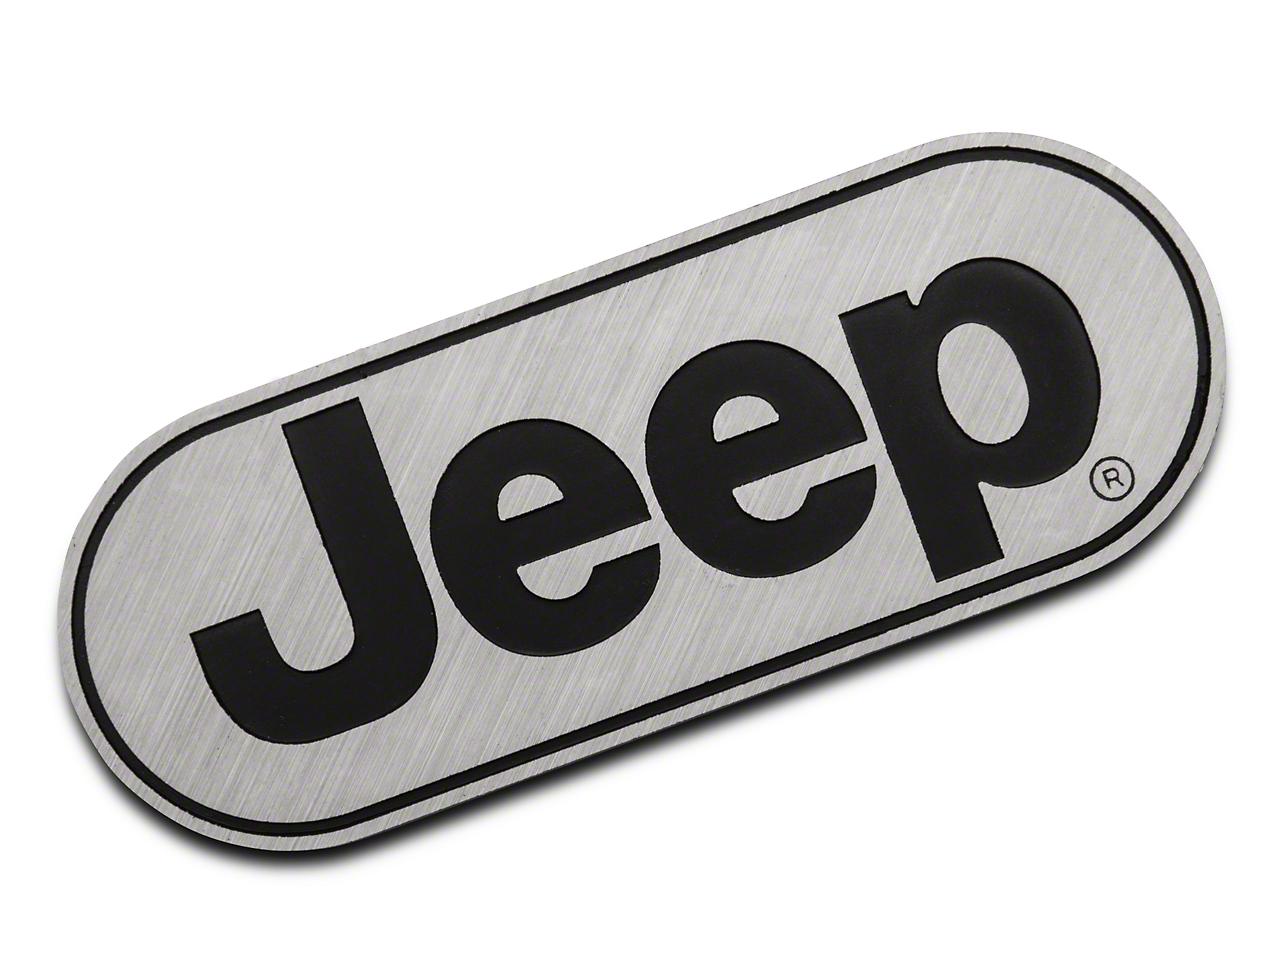 RedRock 4x4 Jeep Logo Hitch Cover (87-18 Wrangler YJ, TJ, JK & JL)